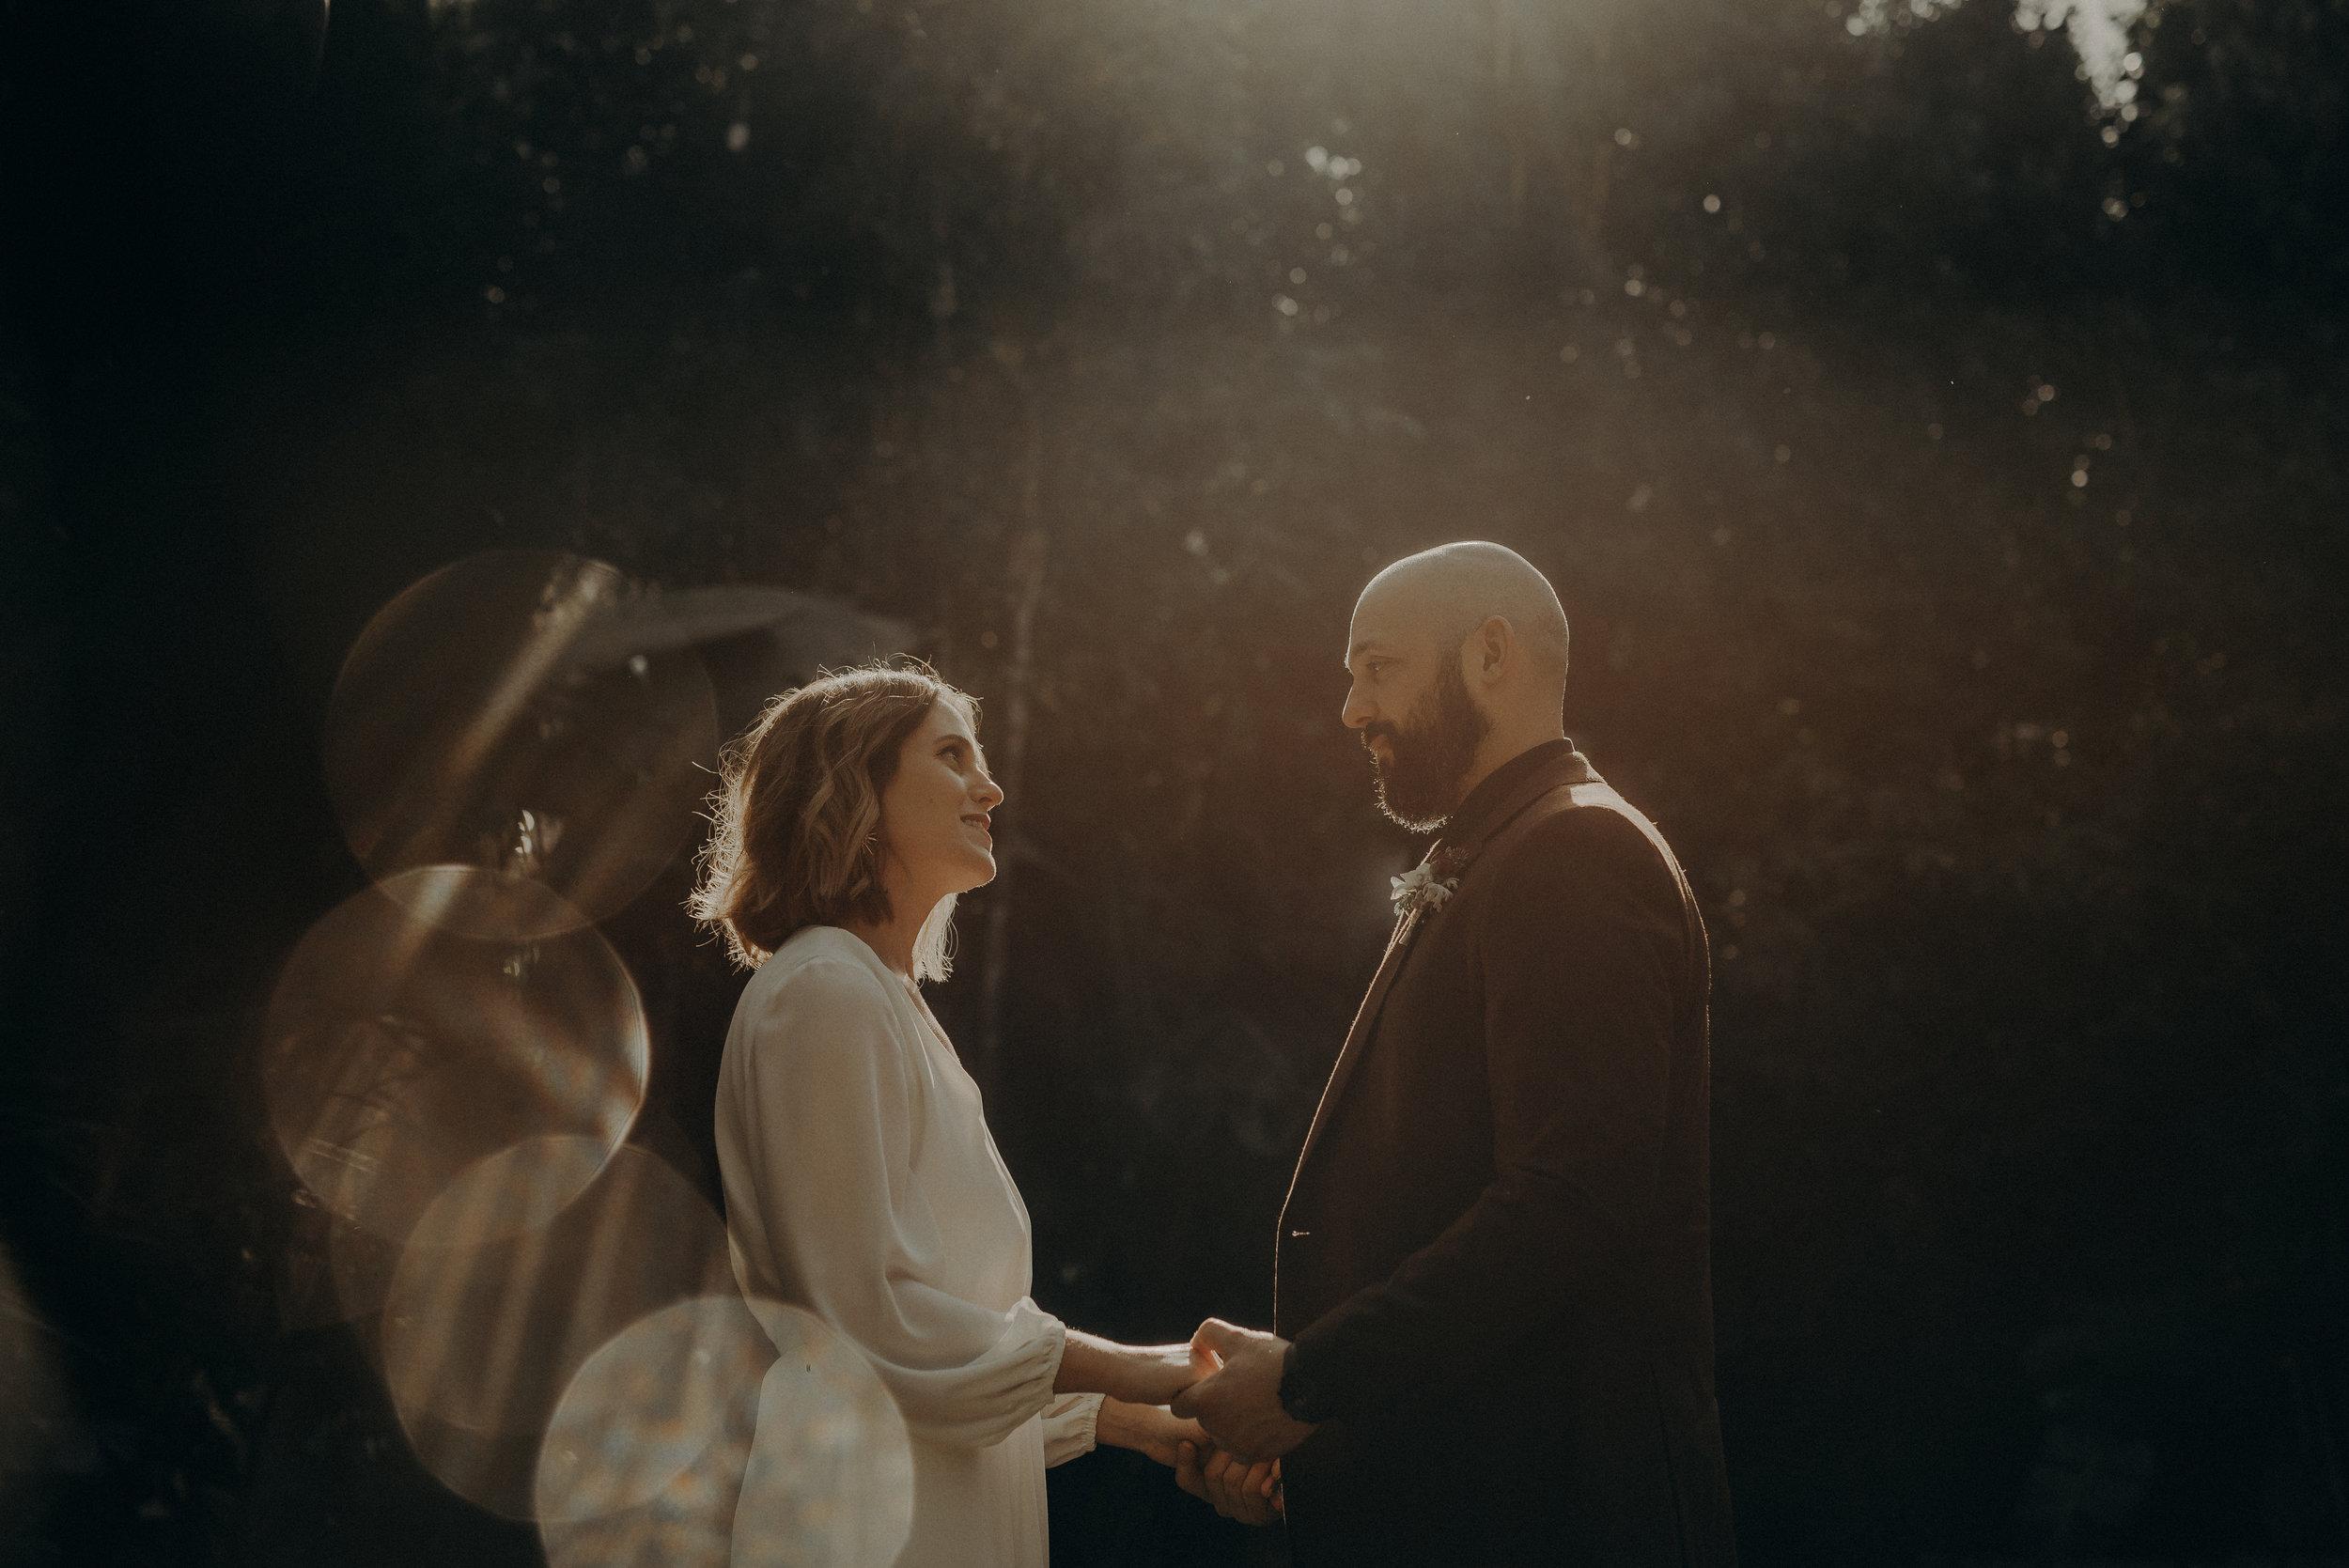 Isaiah + Taylor Photography - Reese + Jonathan Wedding-072.jpg